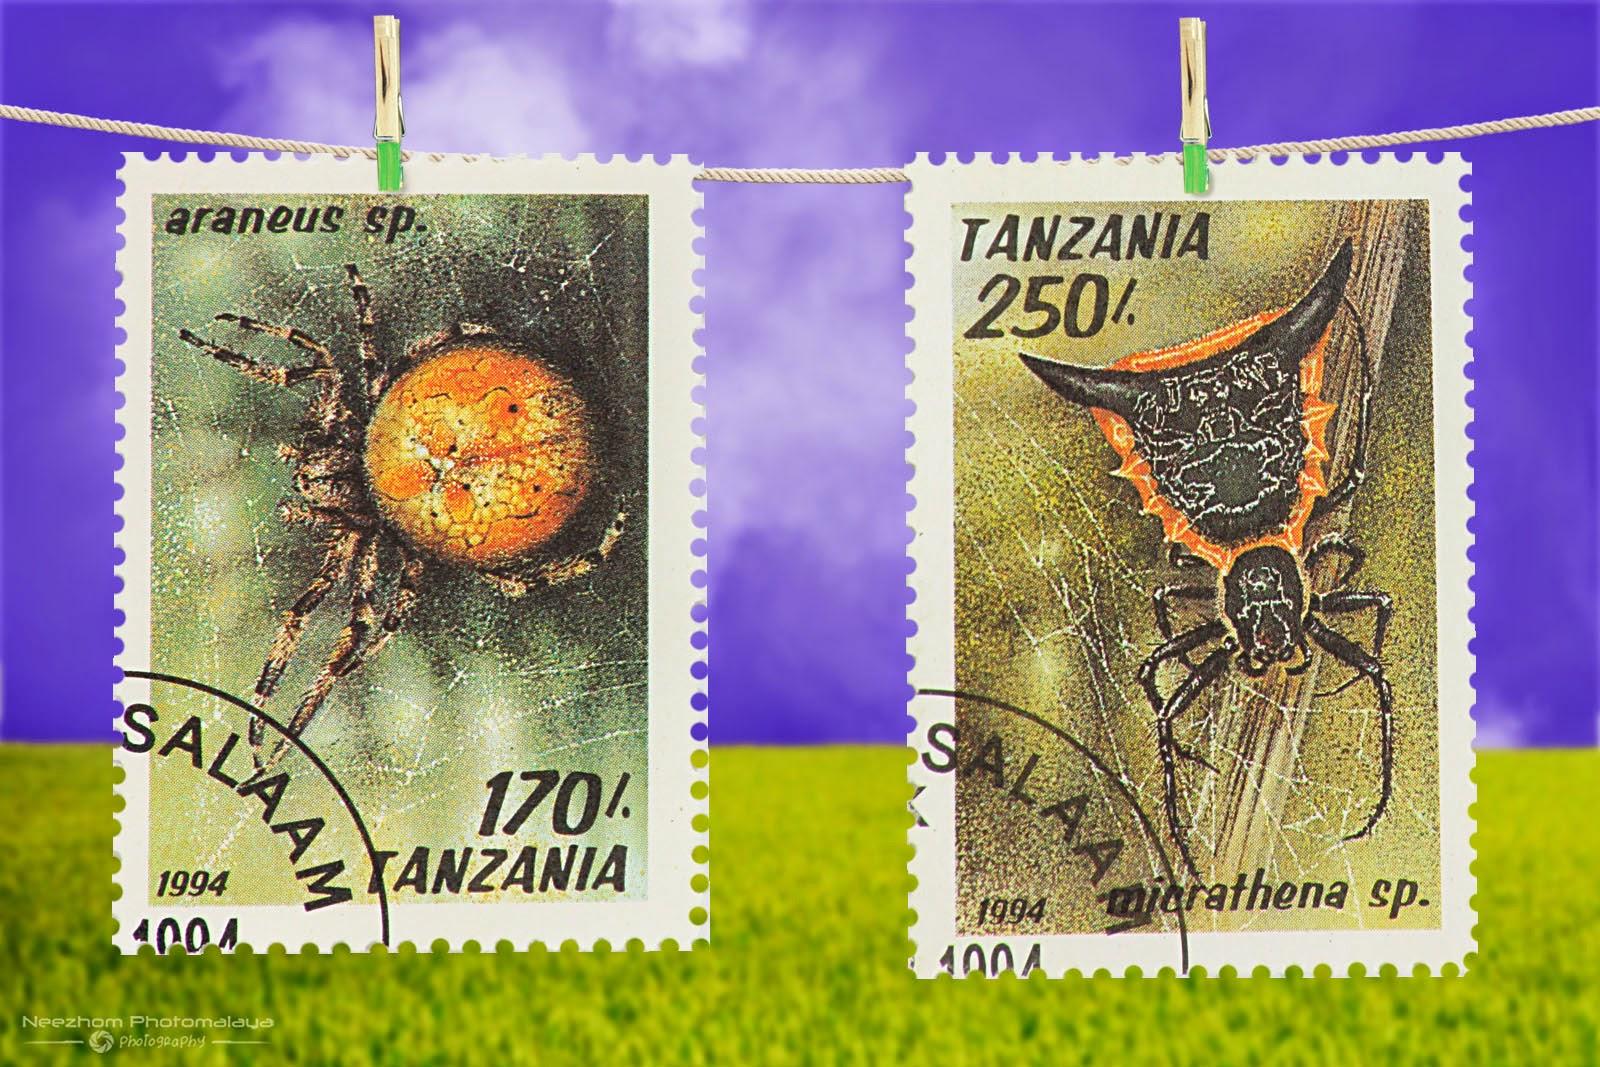 Tanzania Arachnids stamps 1994 - Araneus sp, Micrathena sp